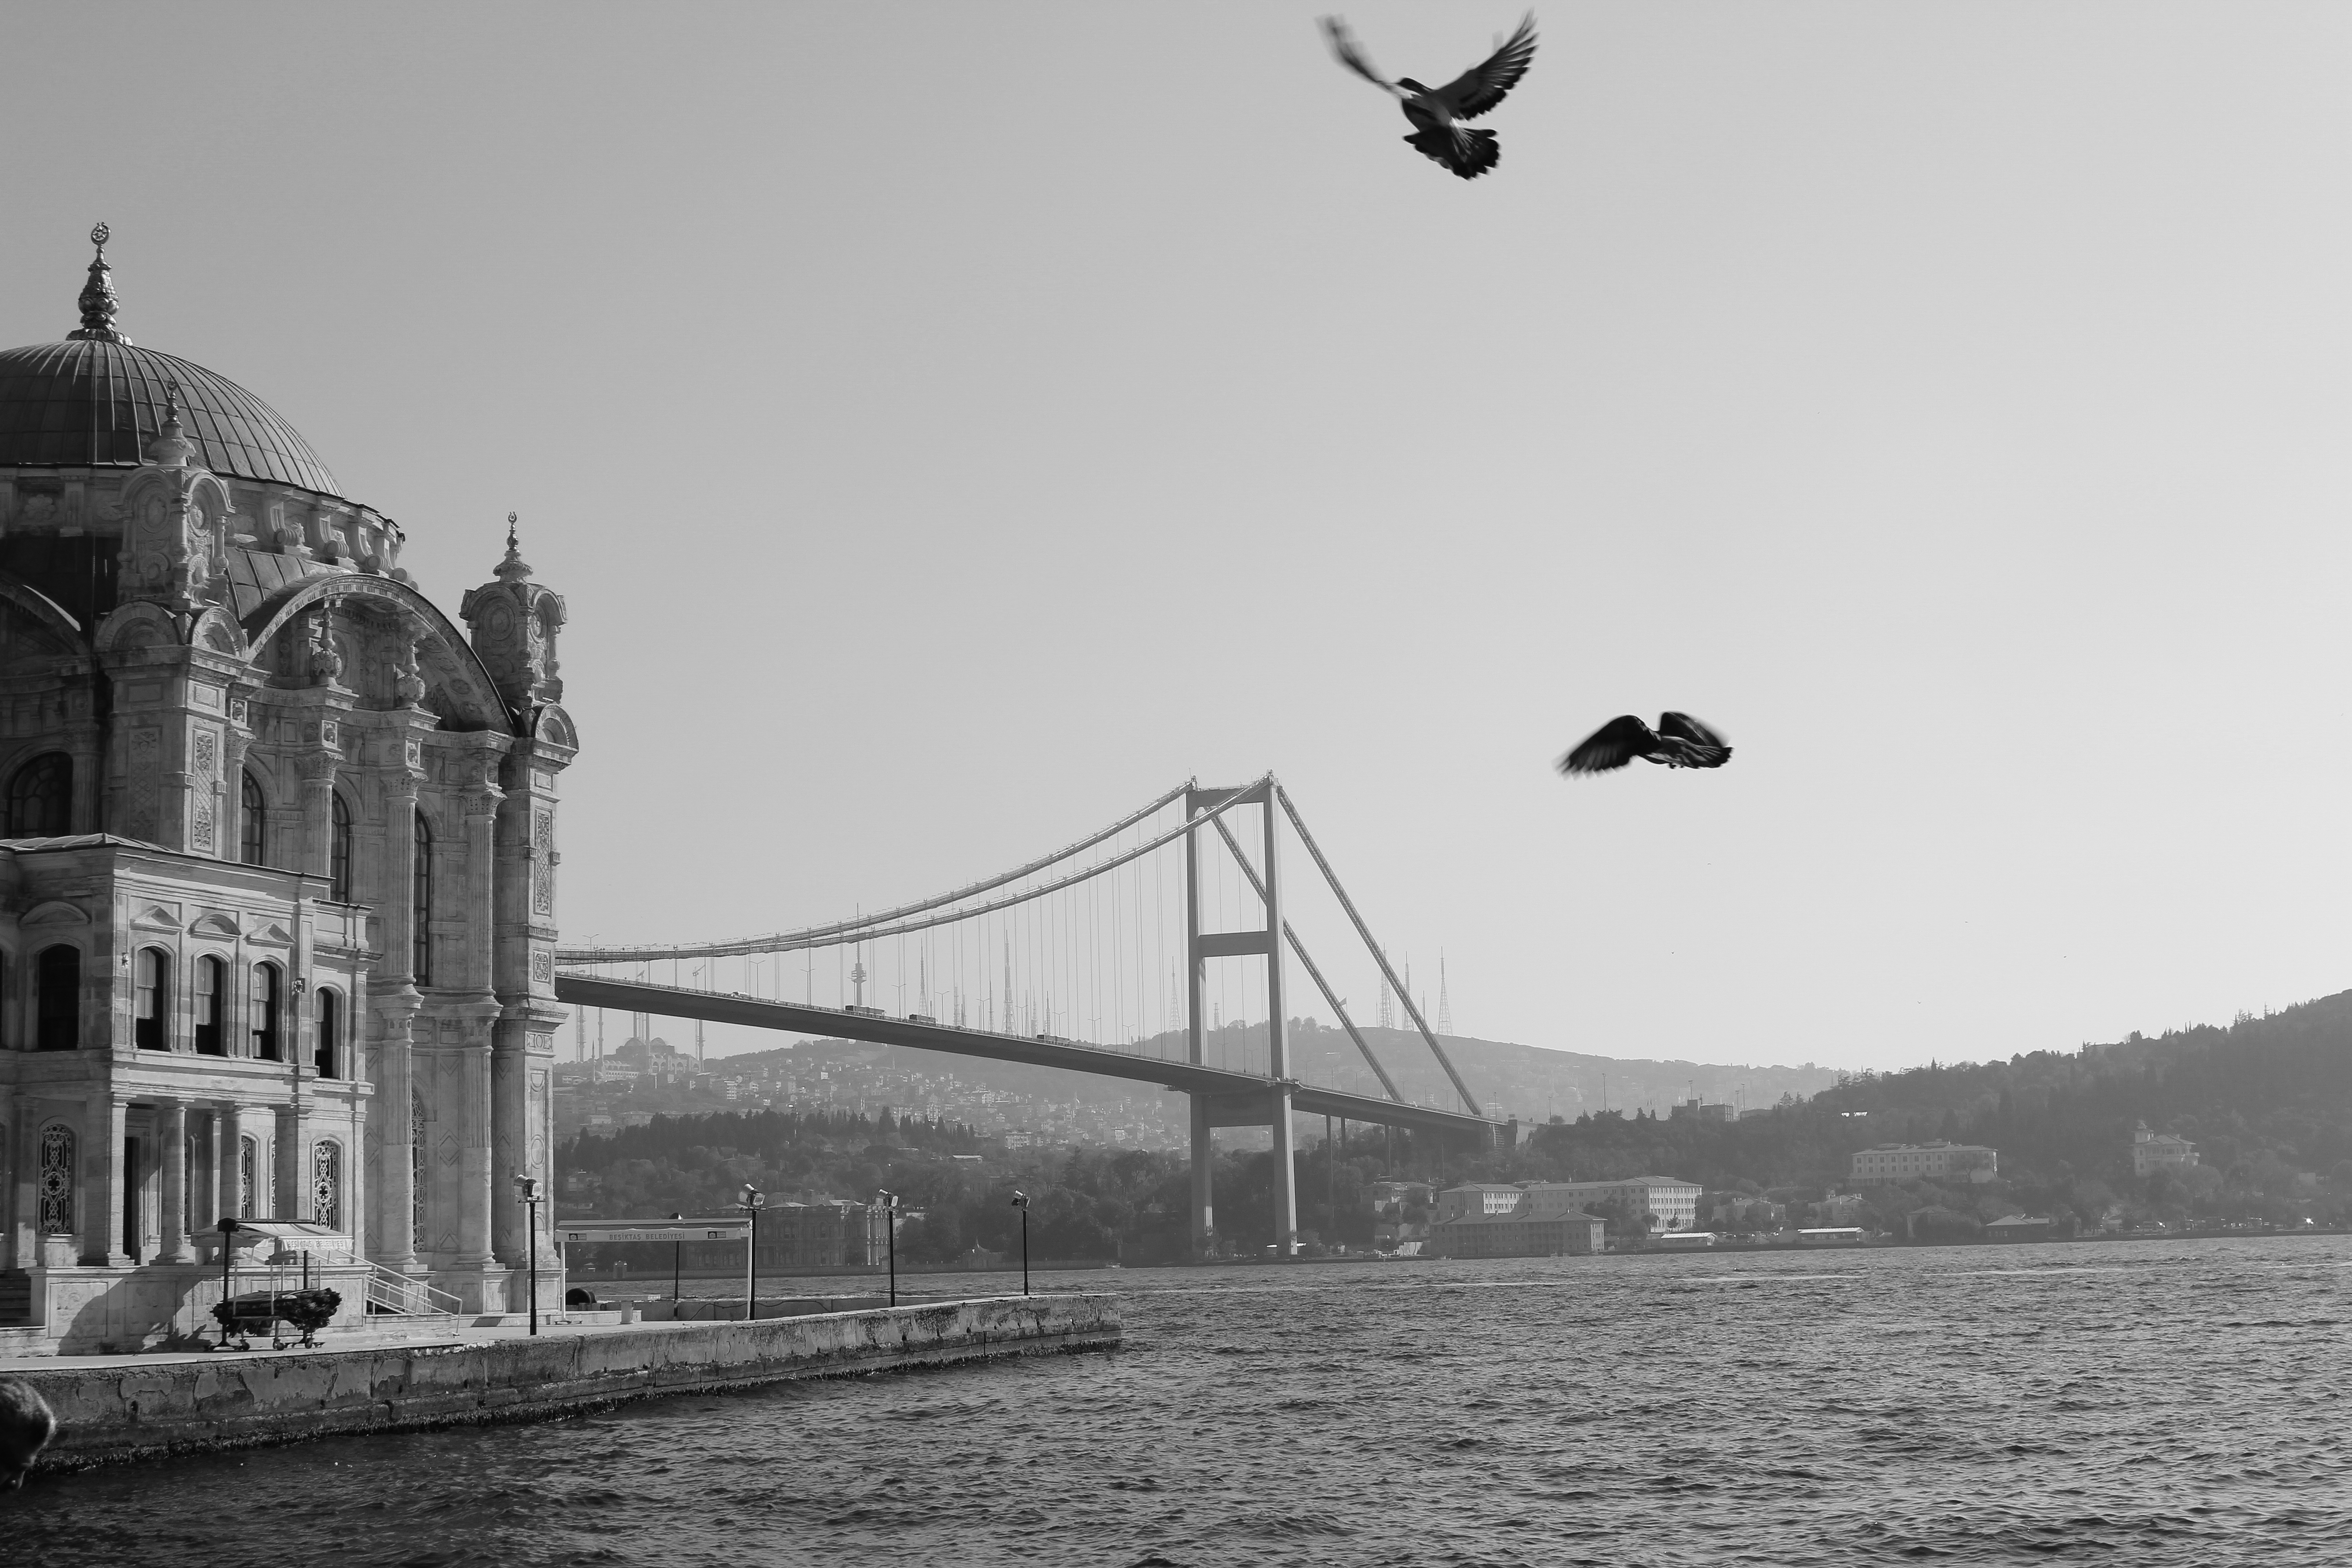 استانبول | دوگانه شرق و غرب